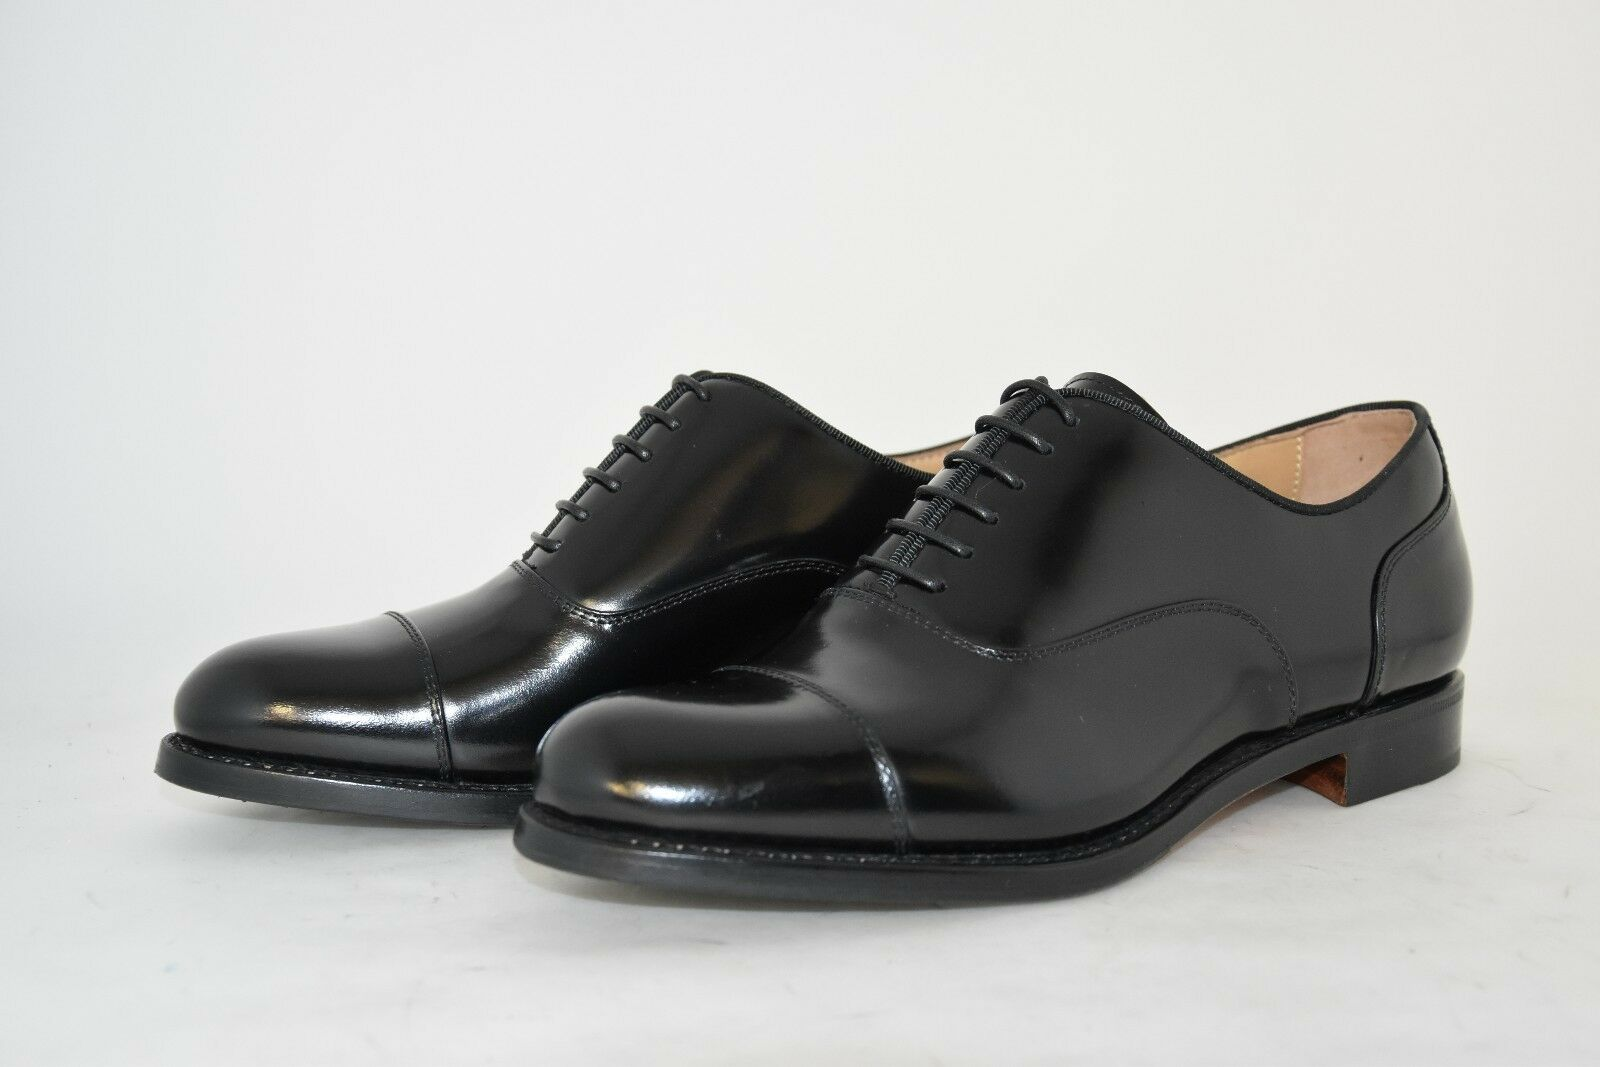 homme-4EU-5US-CAPTOE OXFORD-FRANCESINA-noir CALF-VITELLO noir-LEATHER SOLE